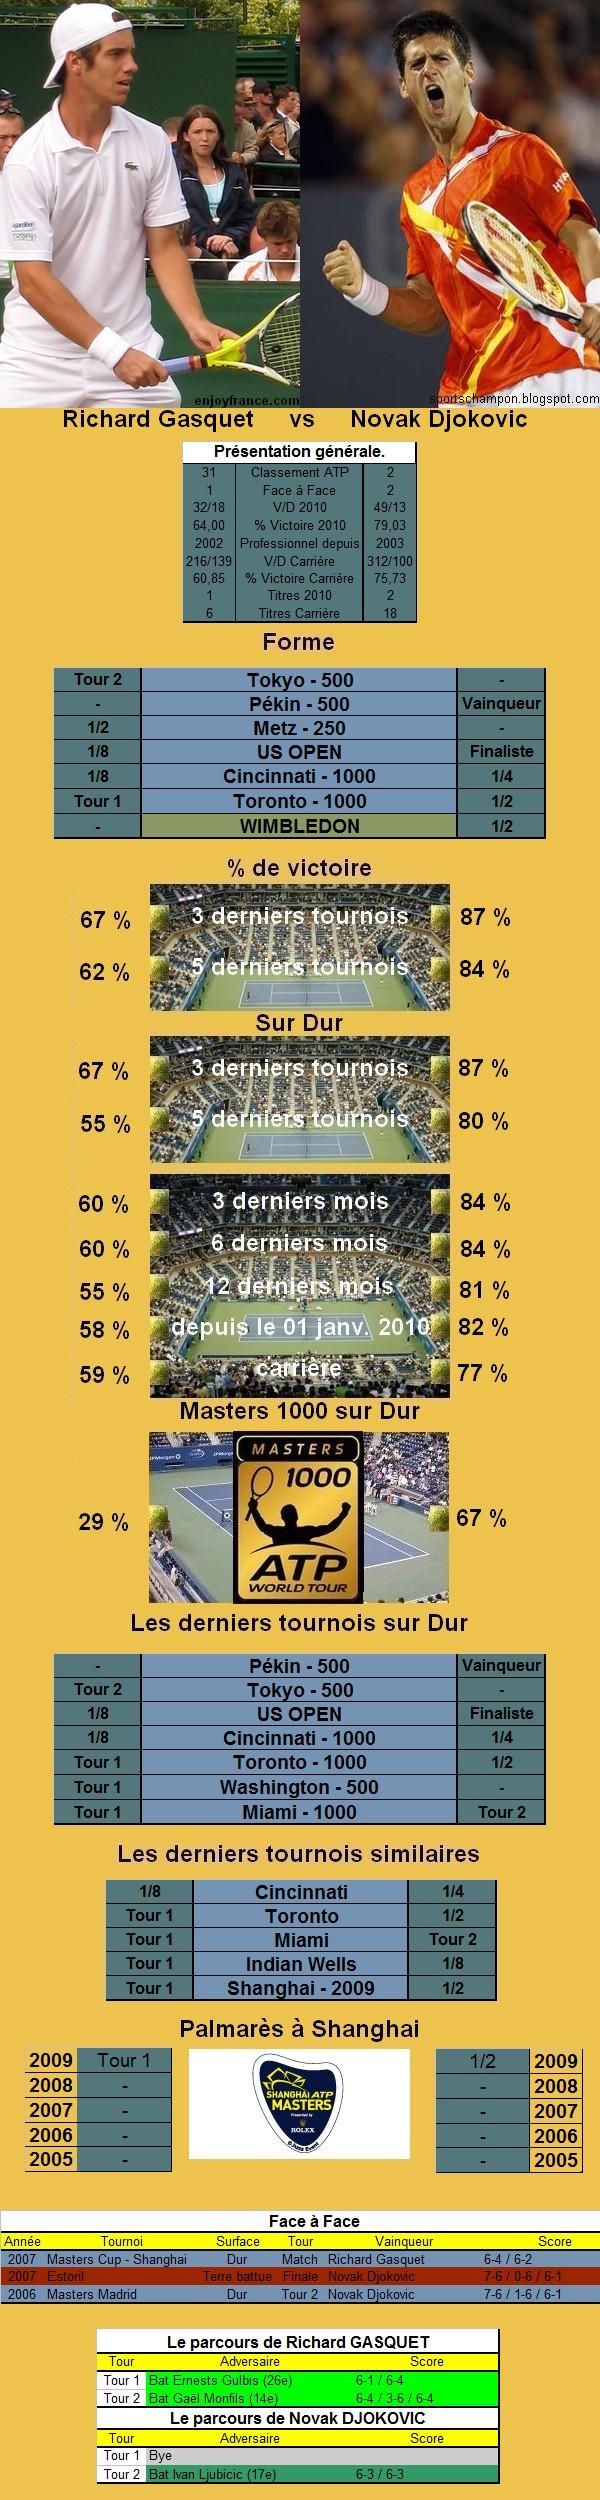 Statistiques tennis de Gasquet contre Djokovic à Shanghai